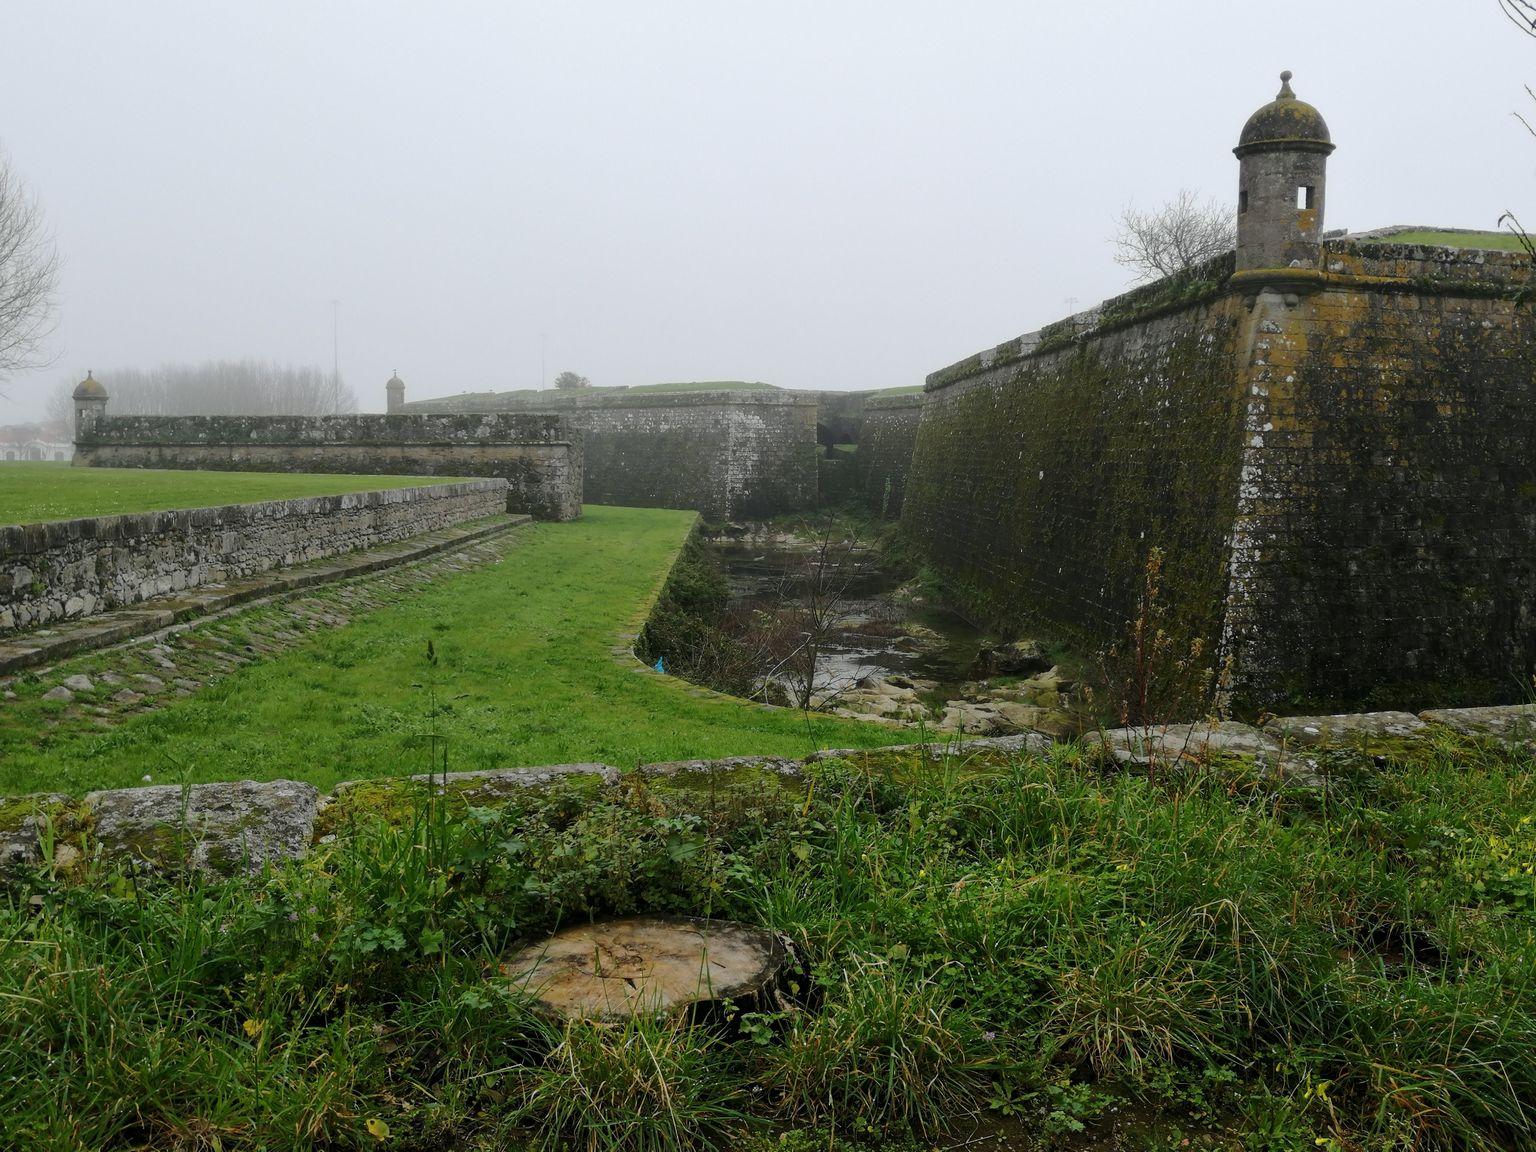 Viana do castelo mars 2020 (28)